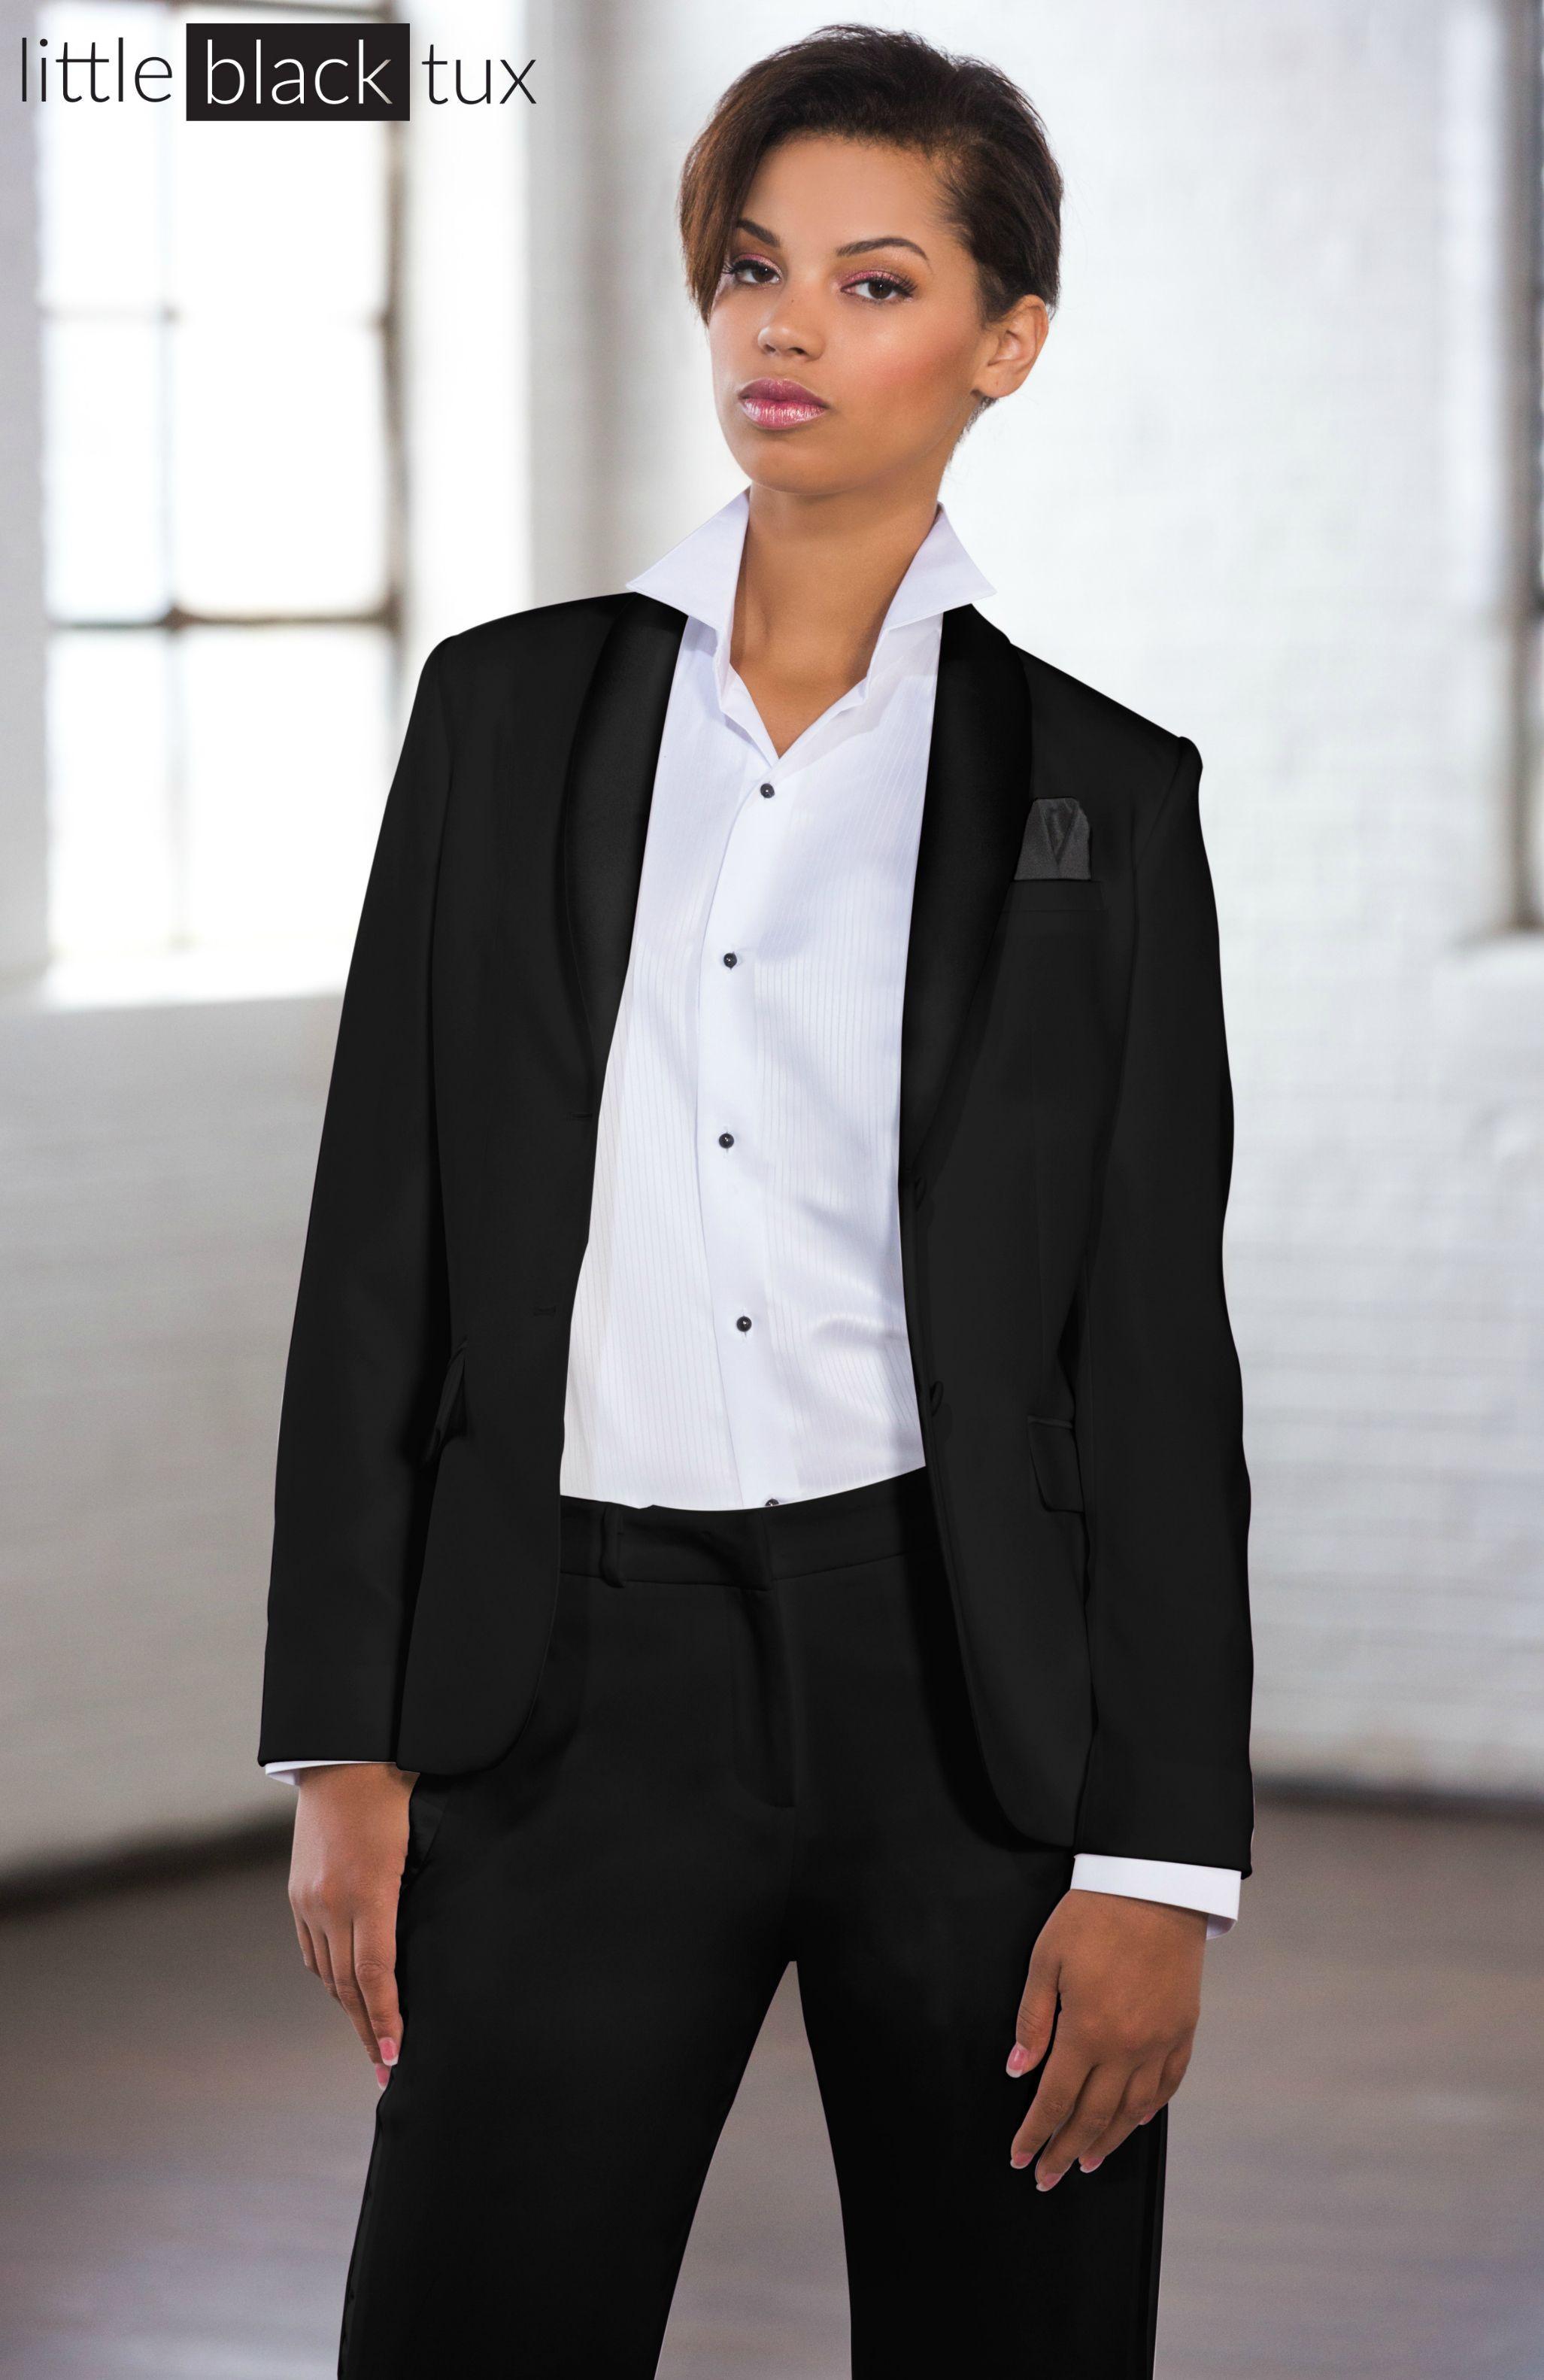 Women S Black Tuxedo Ladytux Shawl Collar Slim Fit Belt Loops